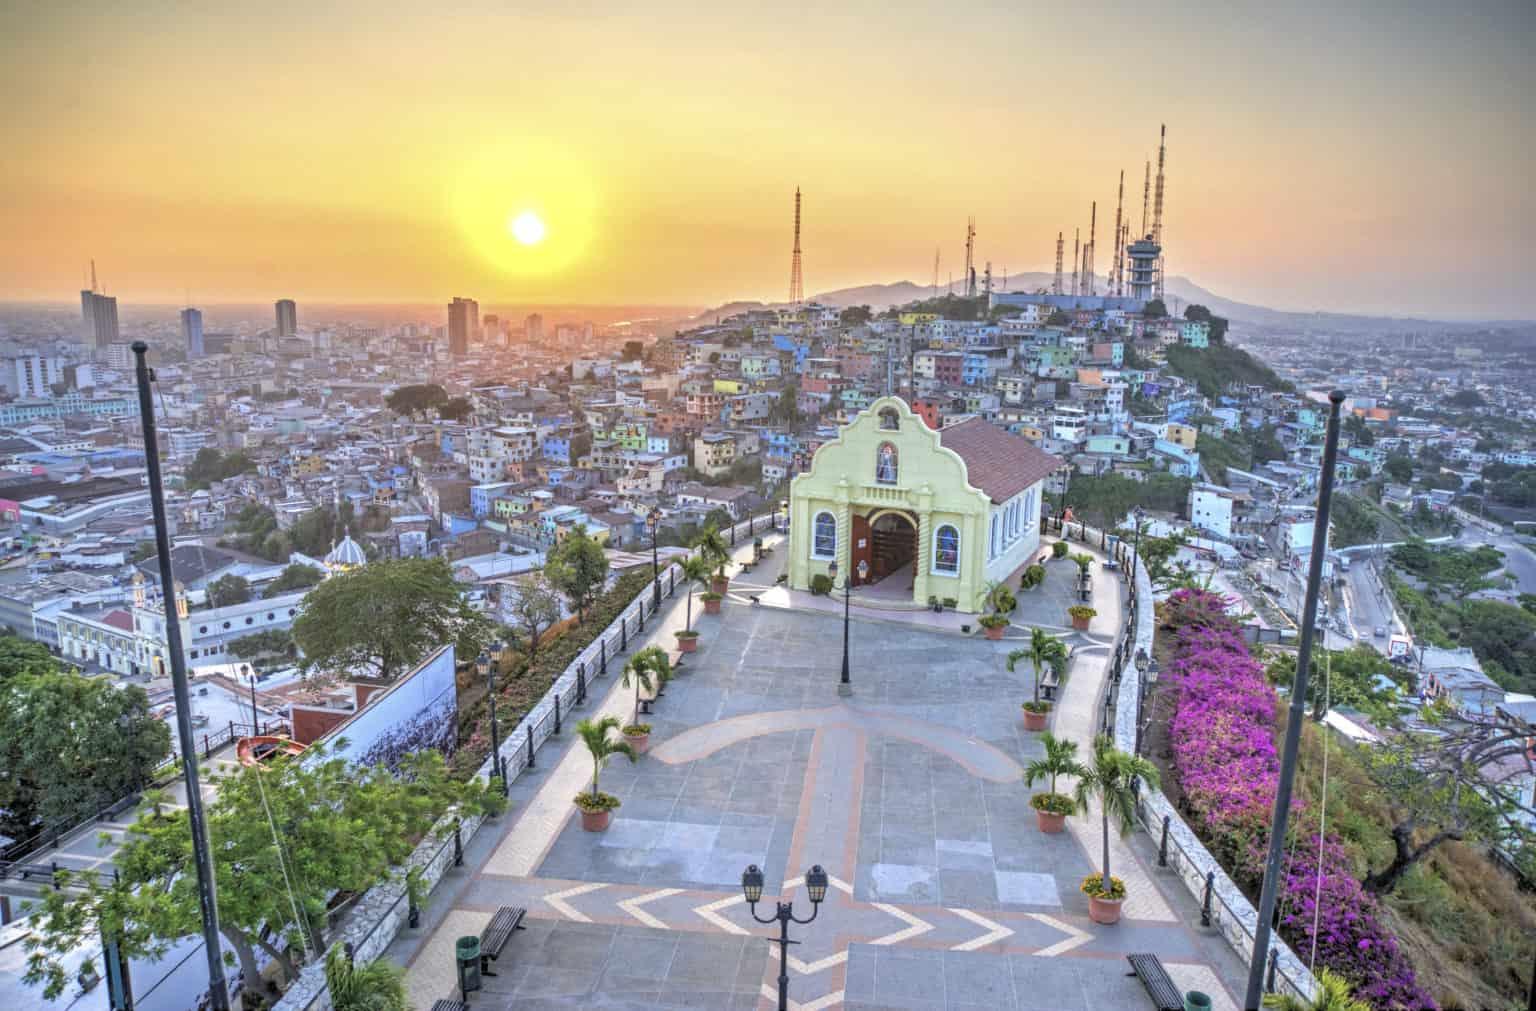 Walking tour in Guayaquil